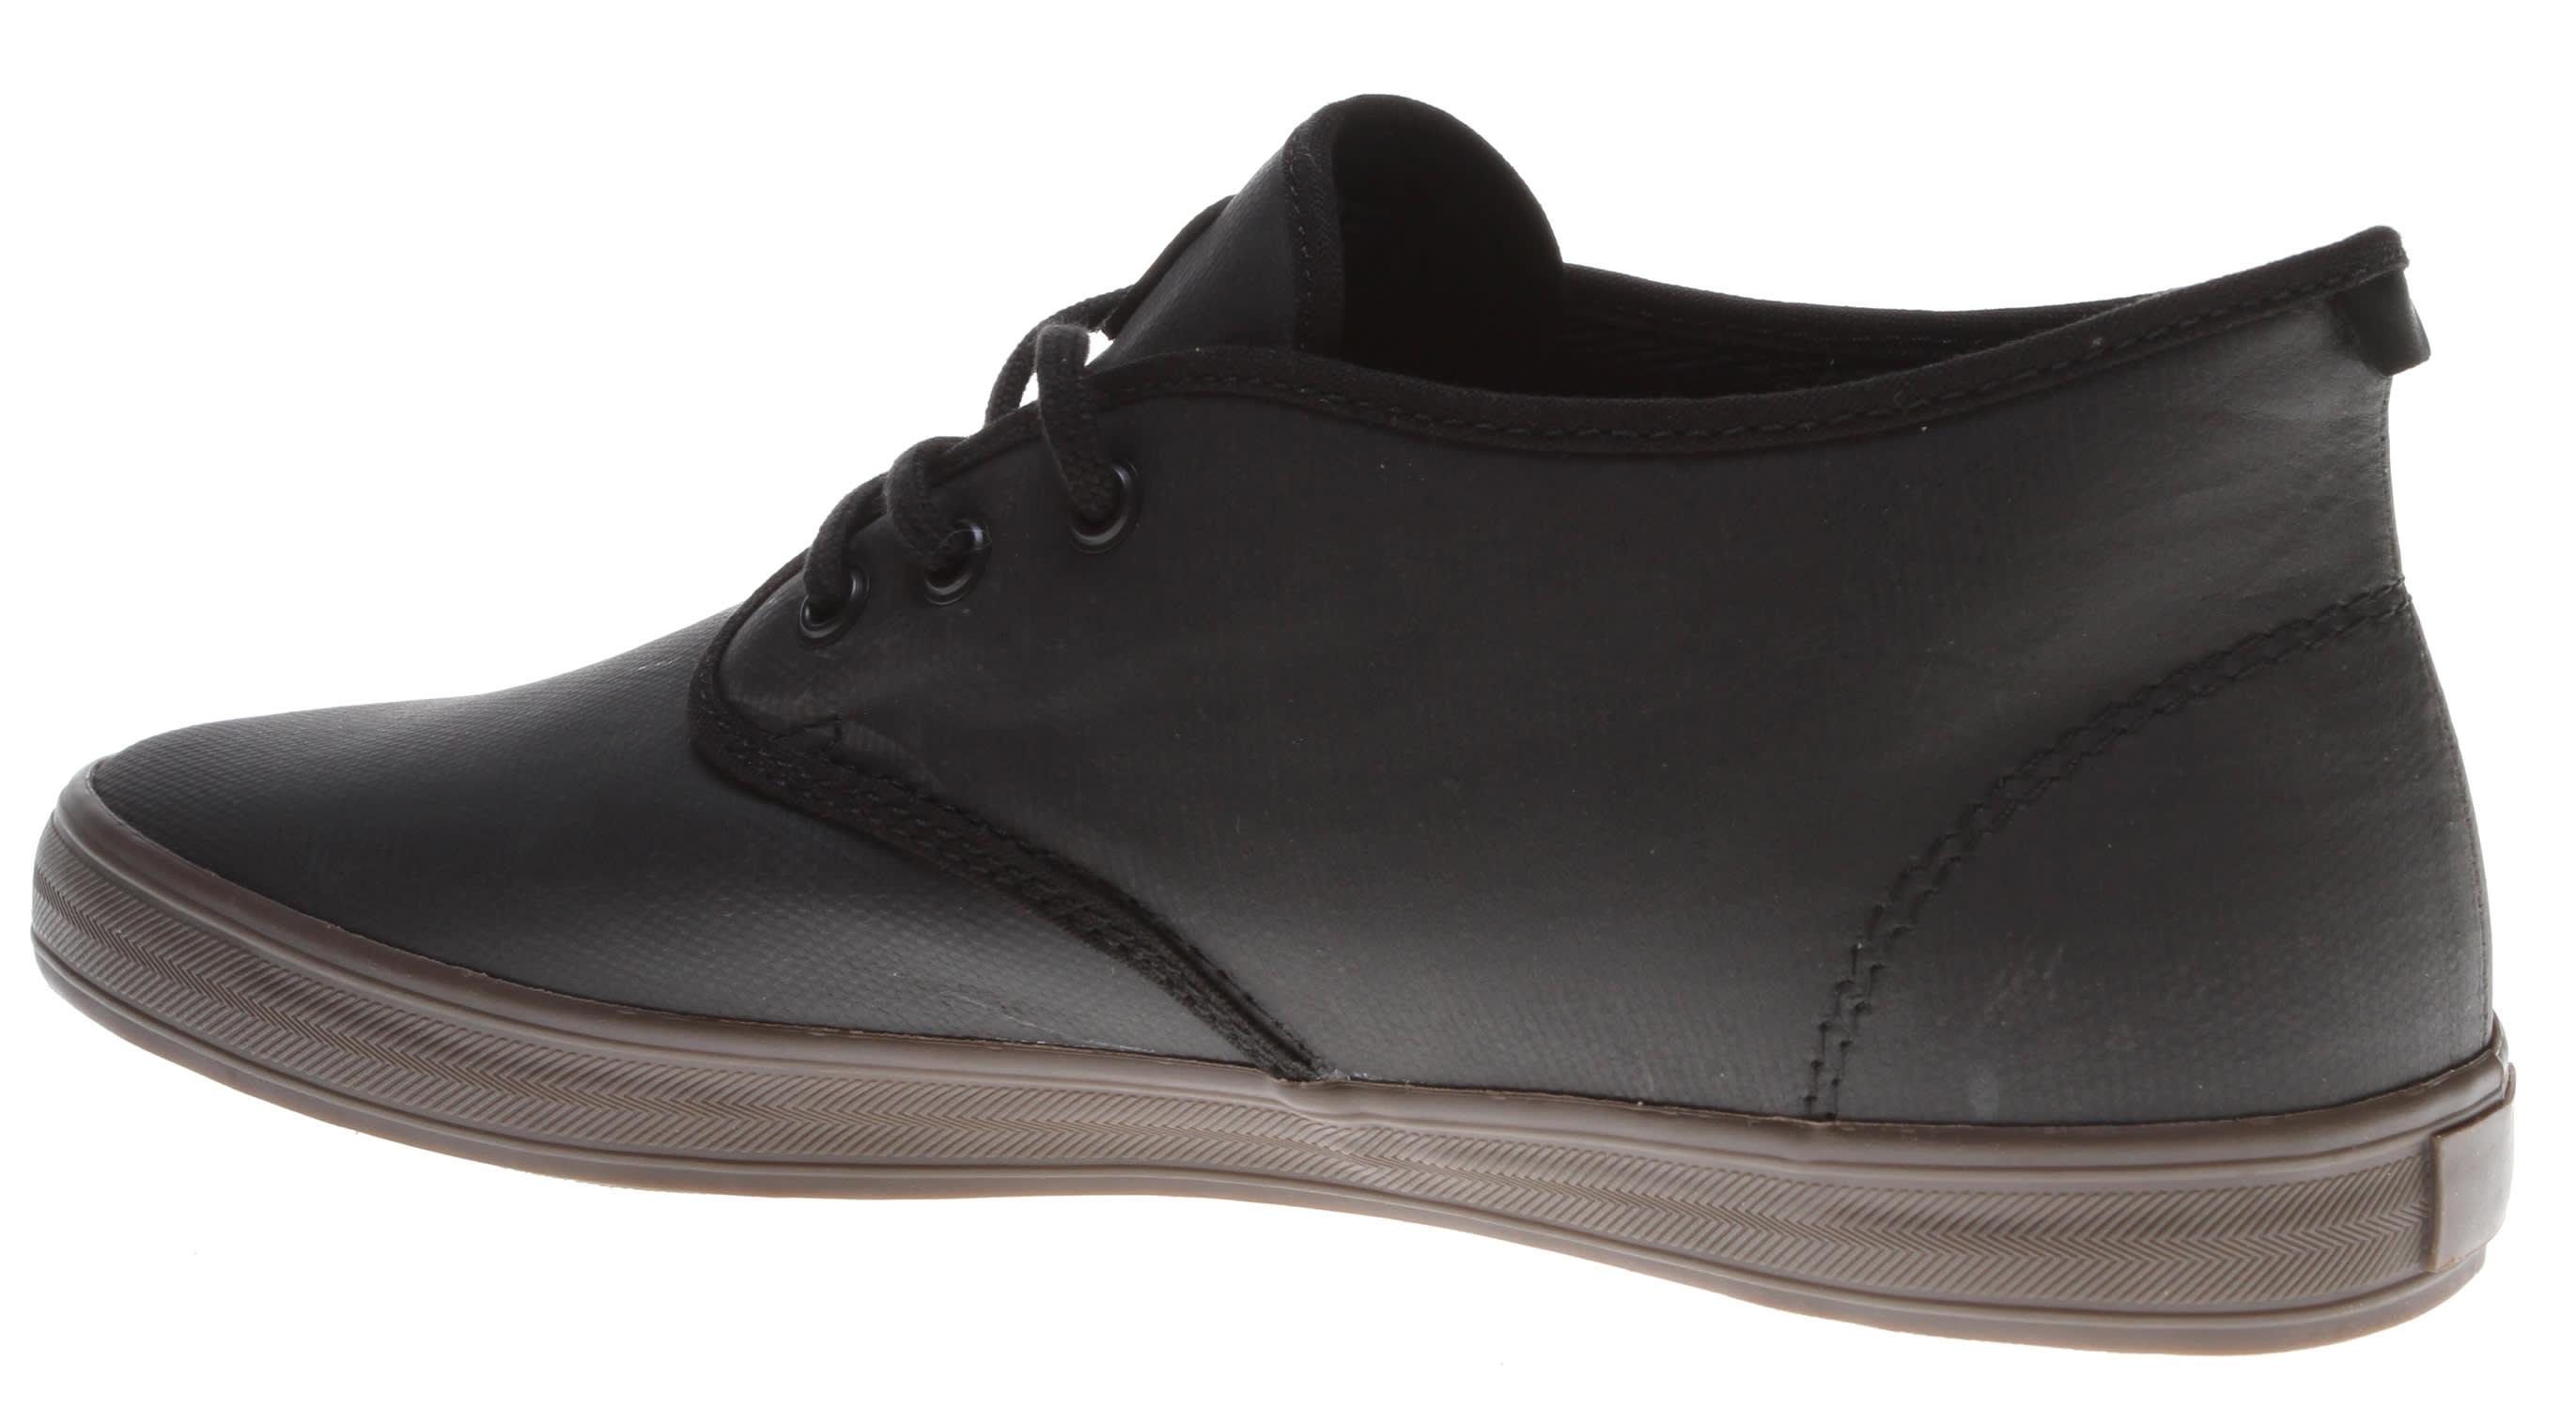 db92f3b657f Gravis Quarters LX Skate Shoes - thumbnail 3